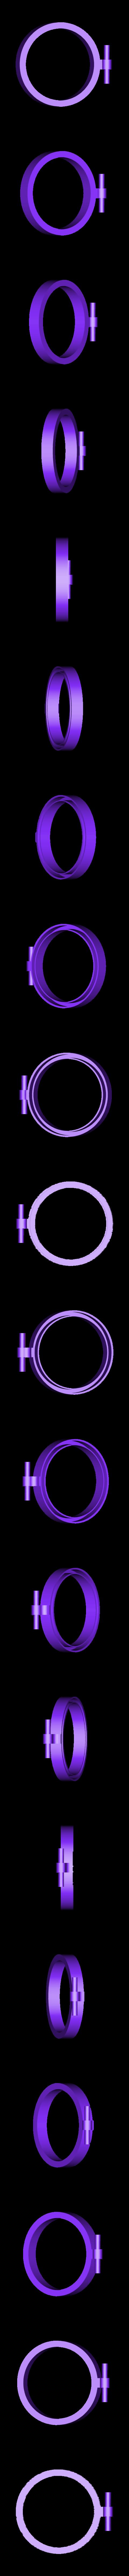 AttachedHinge_LowerPart.stl Download free STL file Jars from bottles • 3D print design, Matlek